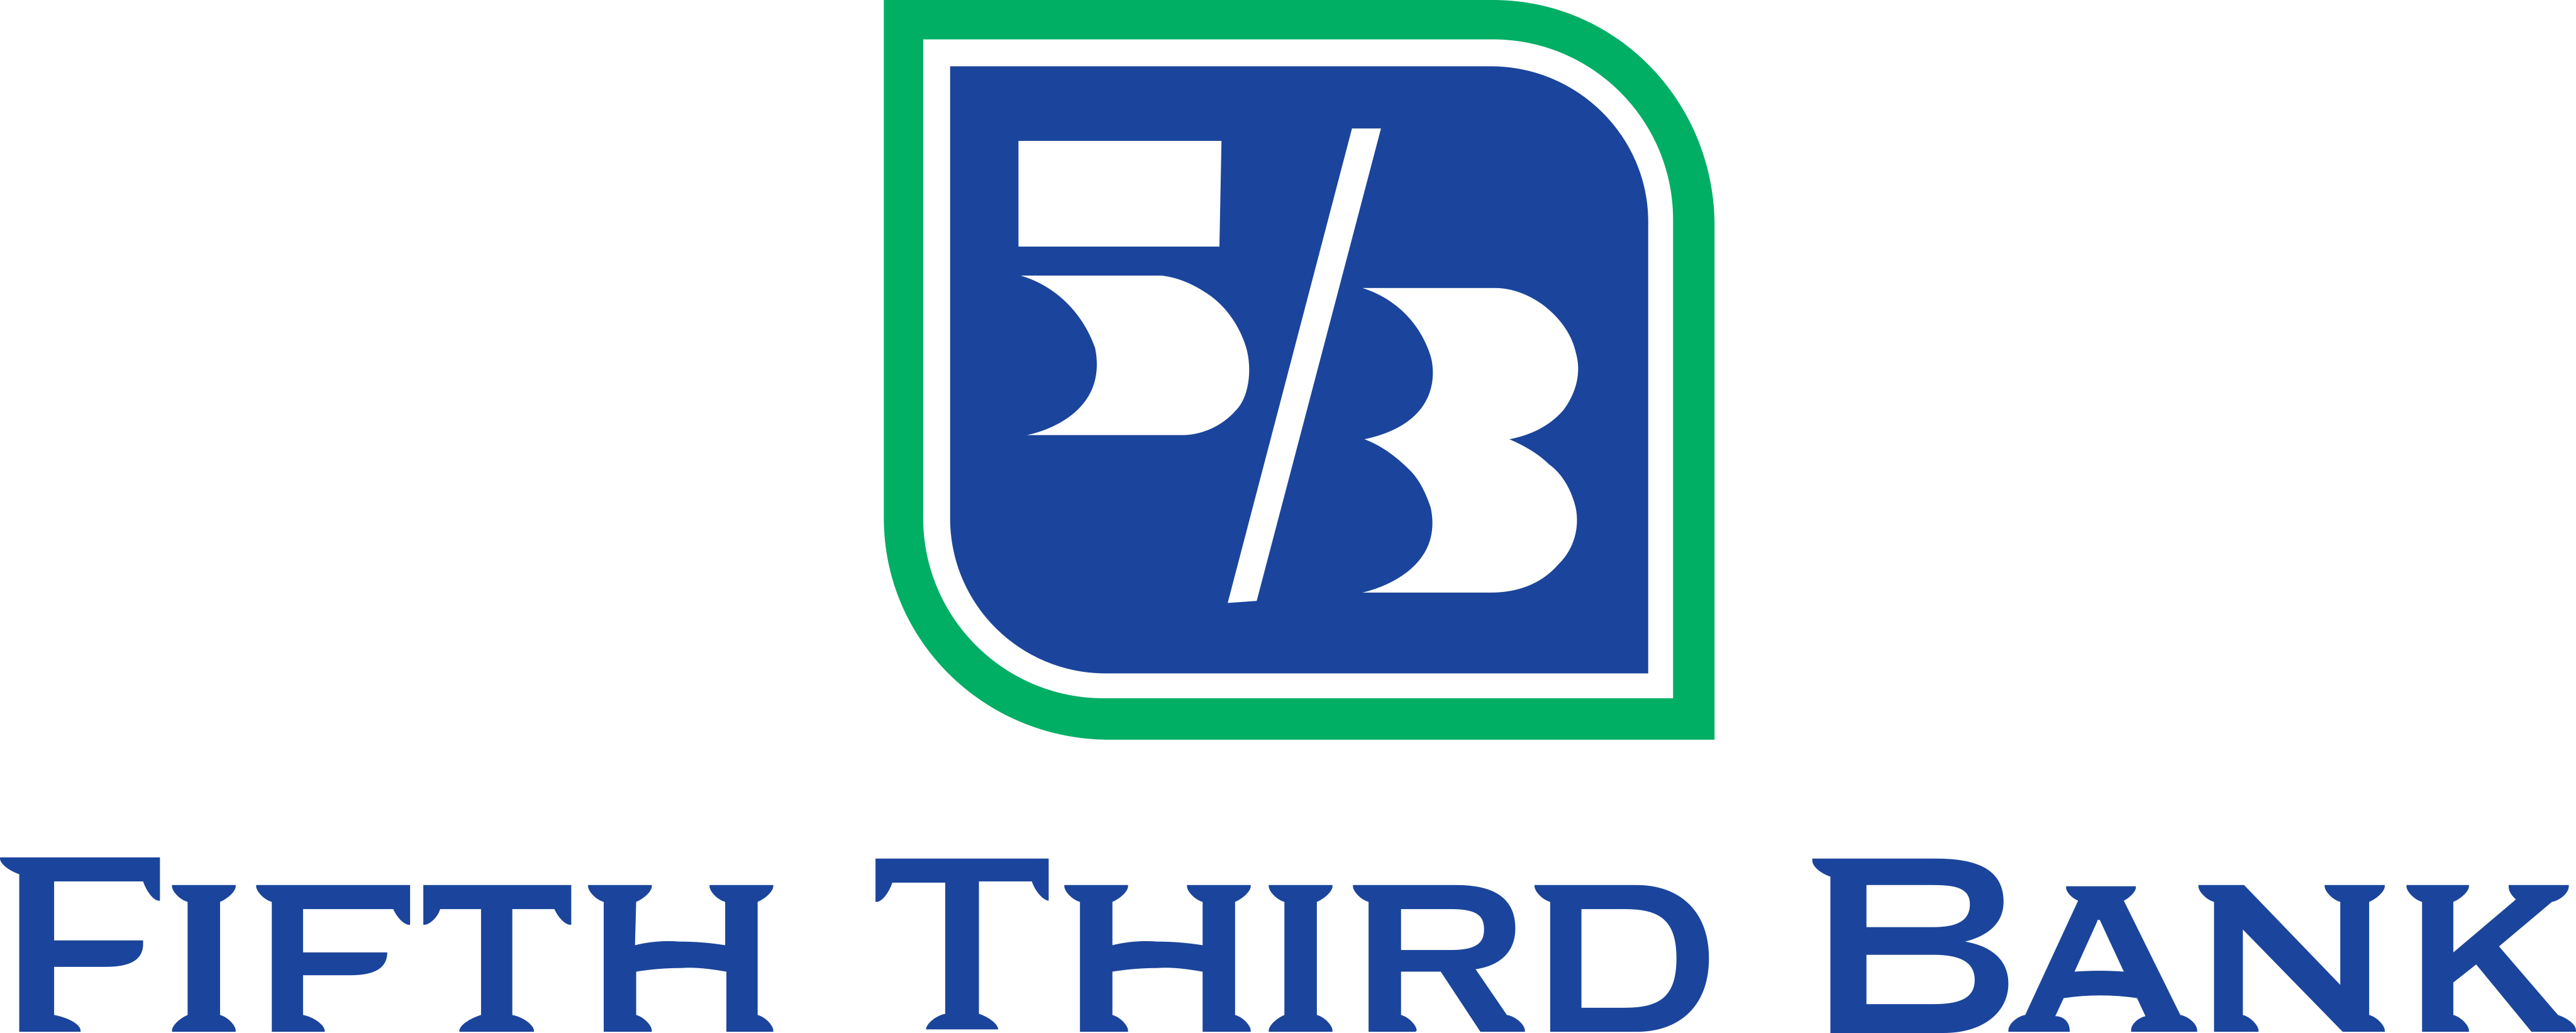 fifth third bank logo 1 - Fifth Third Bank Logo